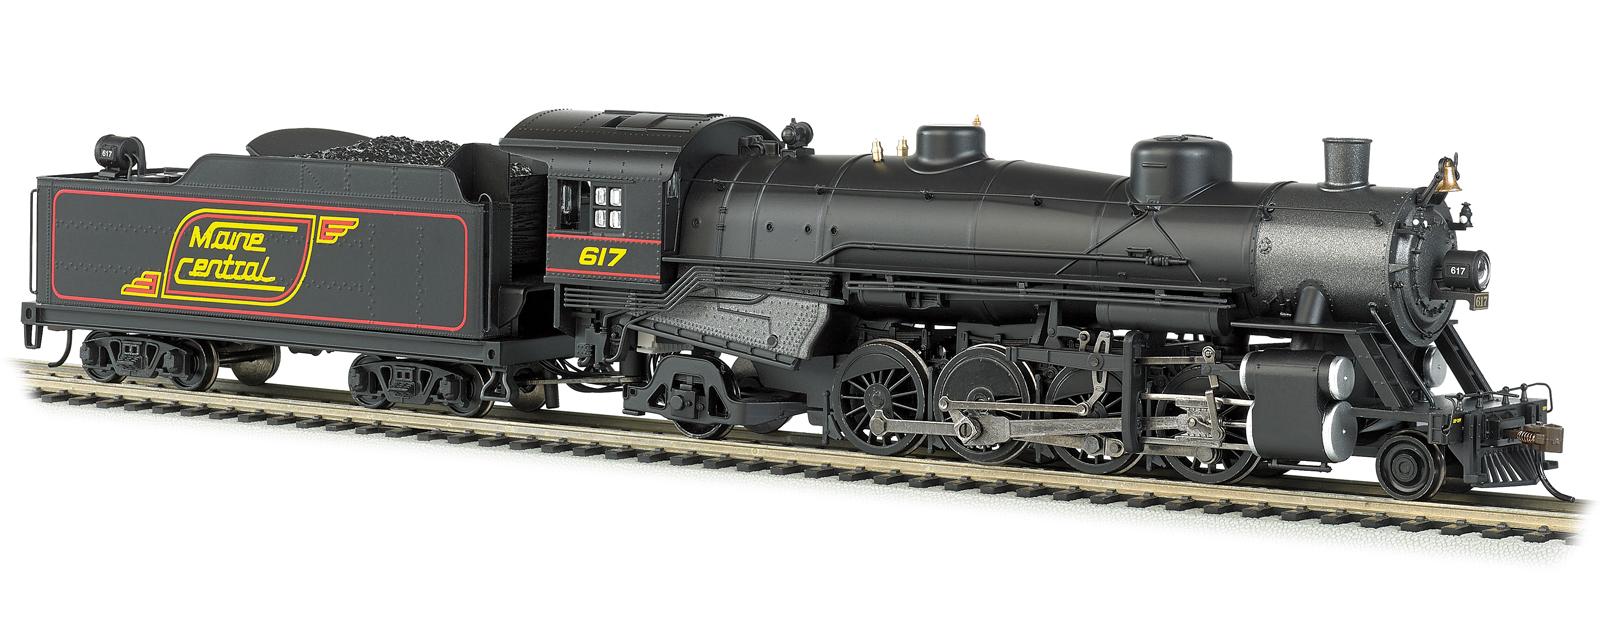 Bachmann Ho Usra Light 2 8 2 Steam Locomotive With Medium